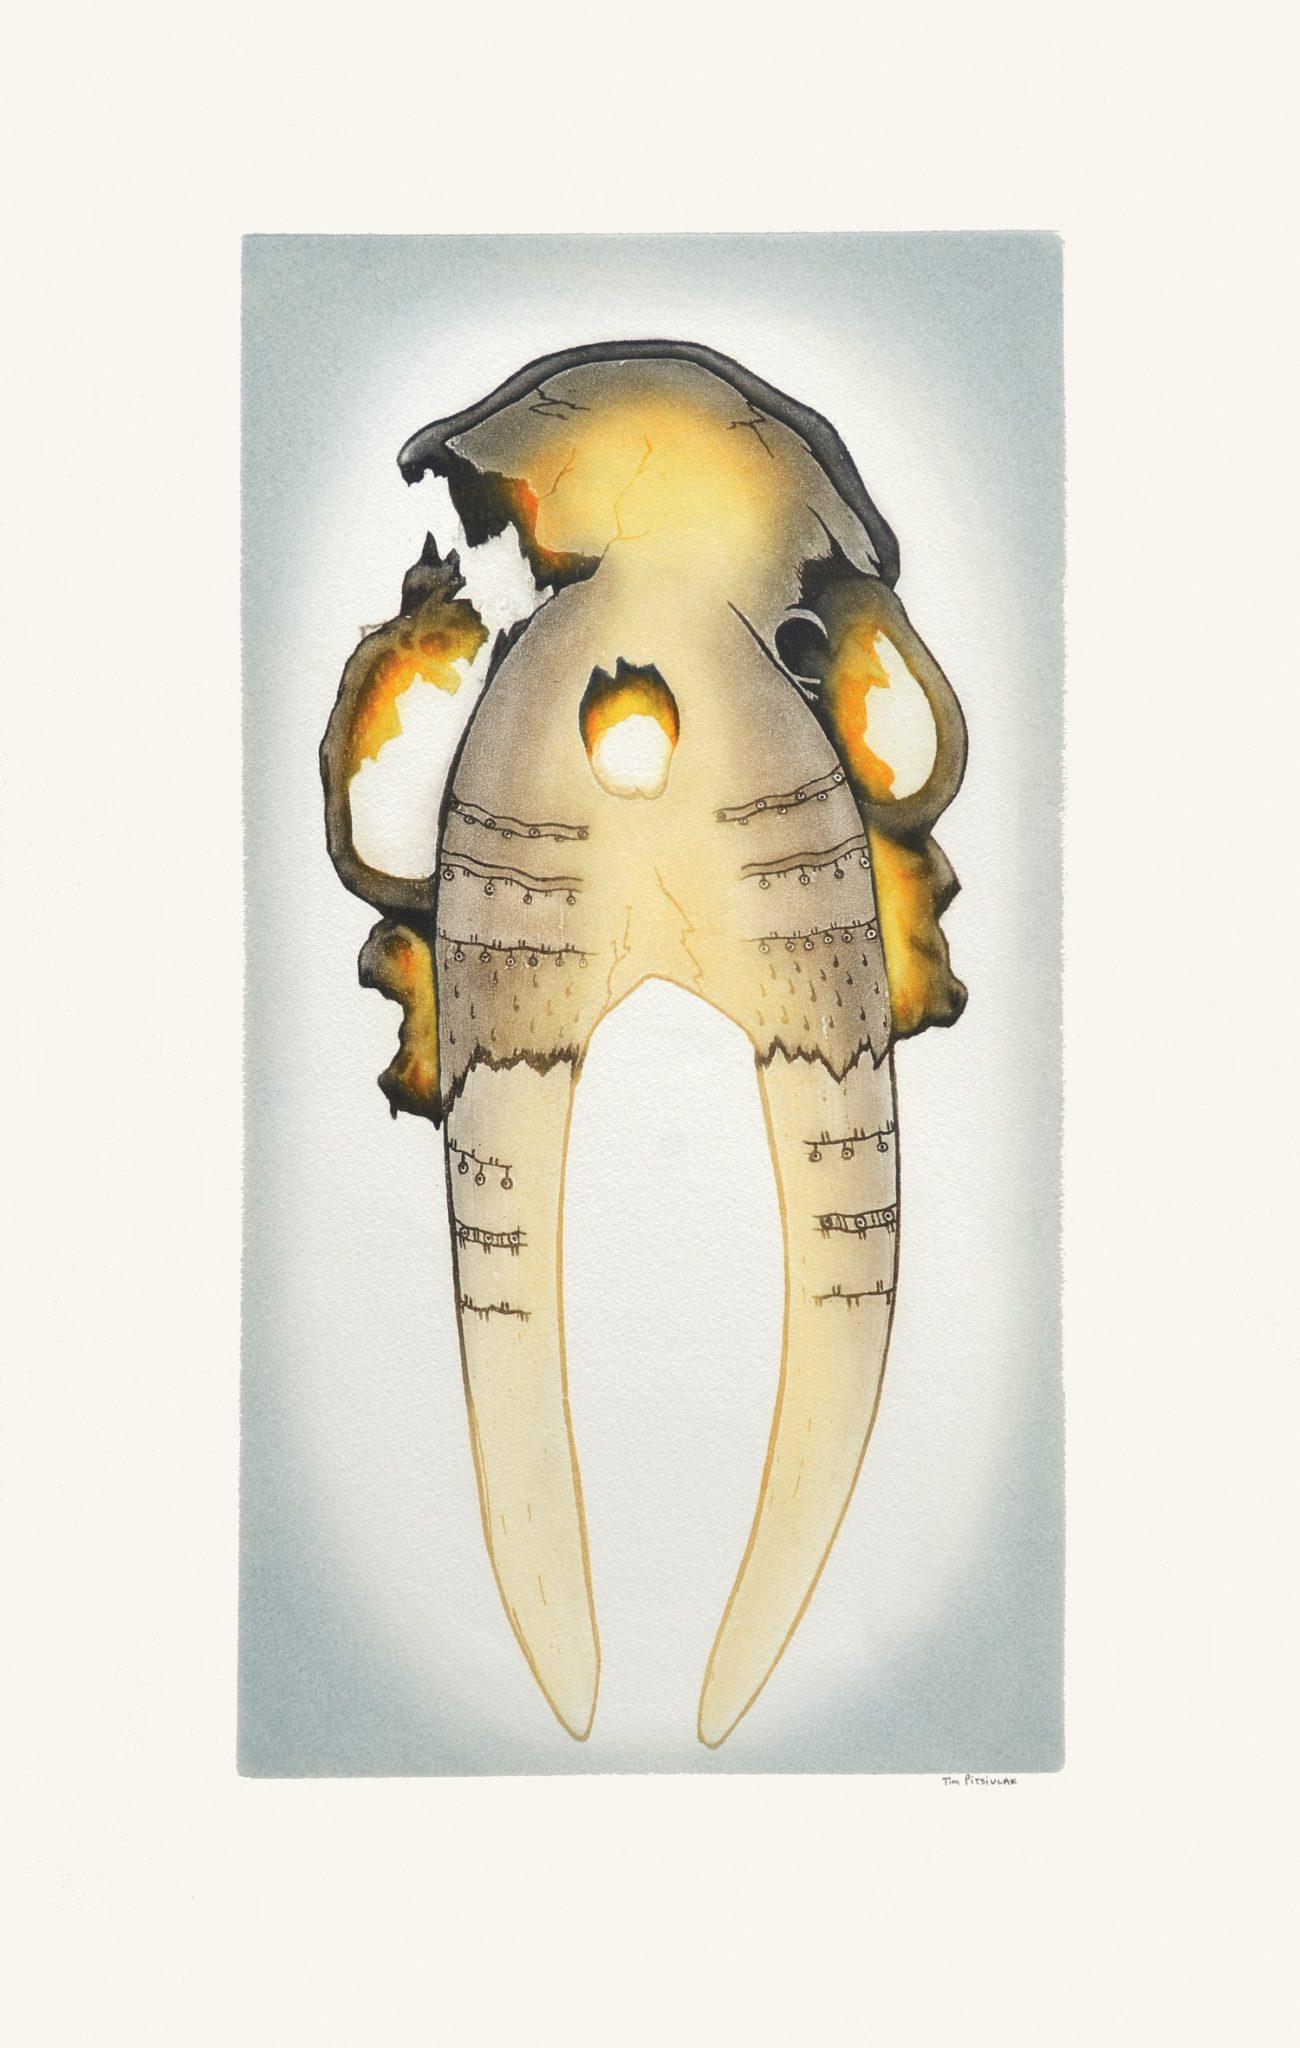 Tim Pitsiulak Ancient Walrus Skull Etching & Aquatint Cape Dorset Print Collection 2016 650